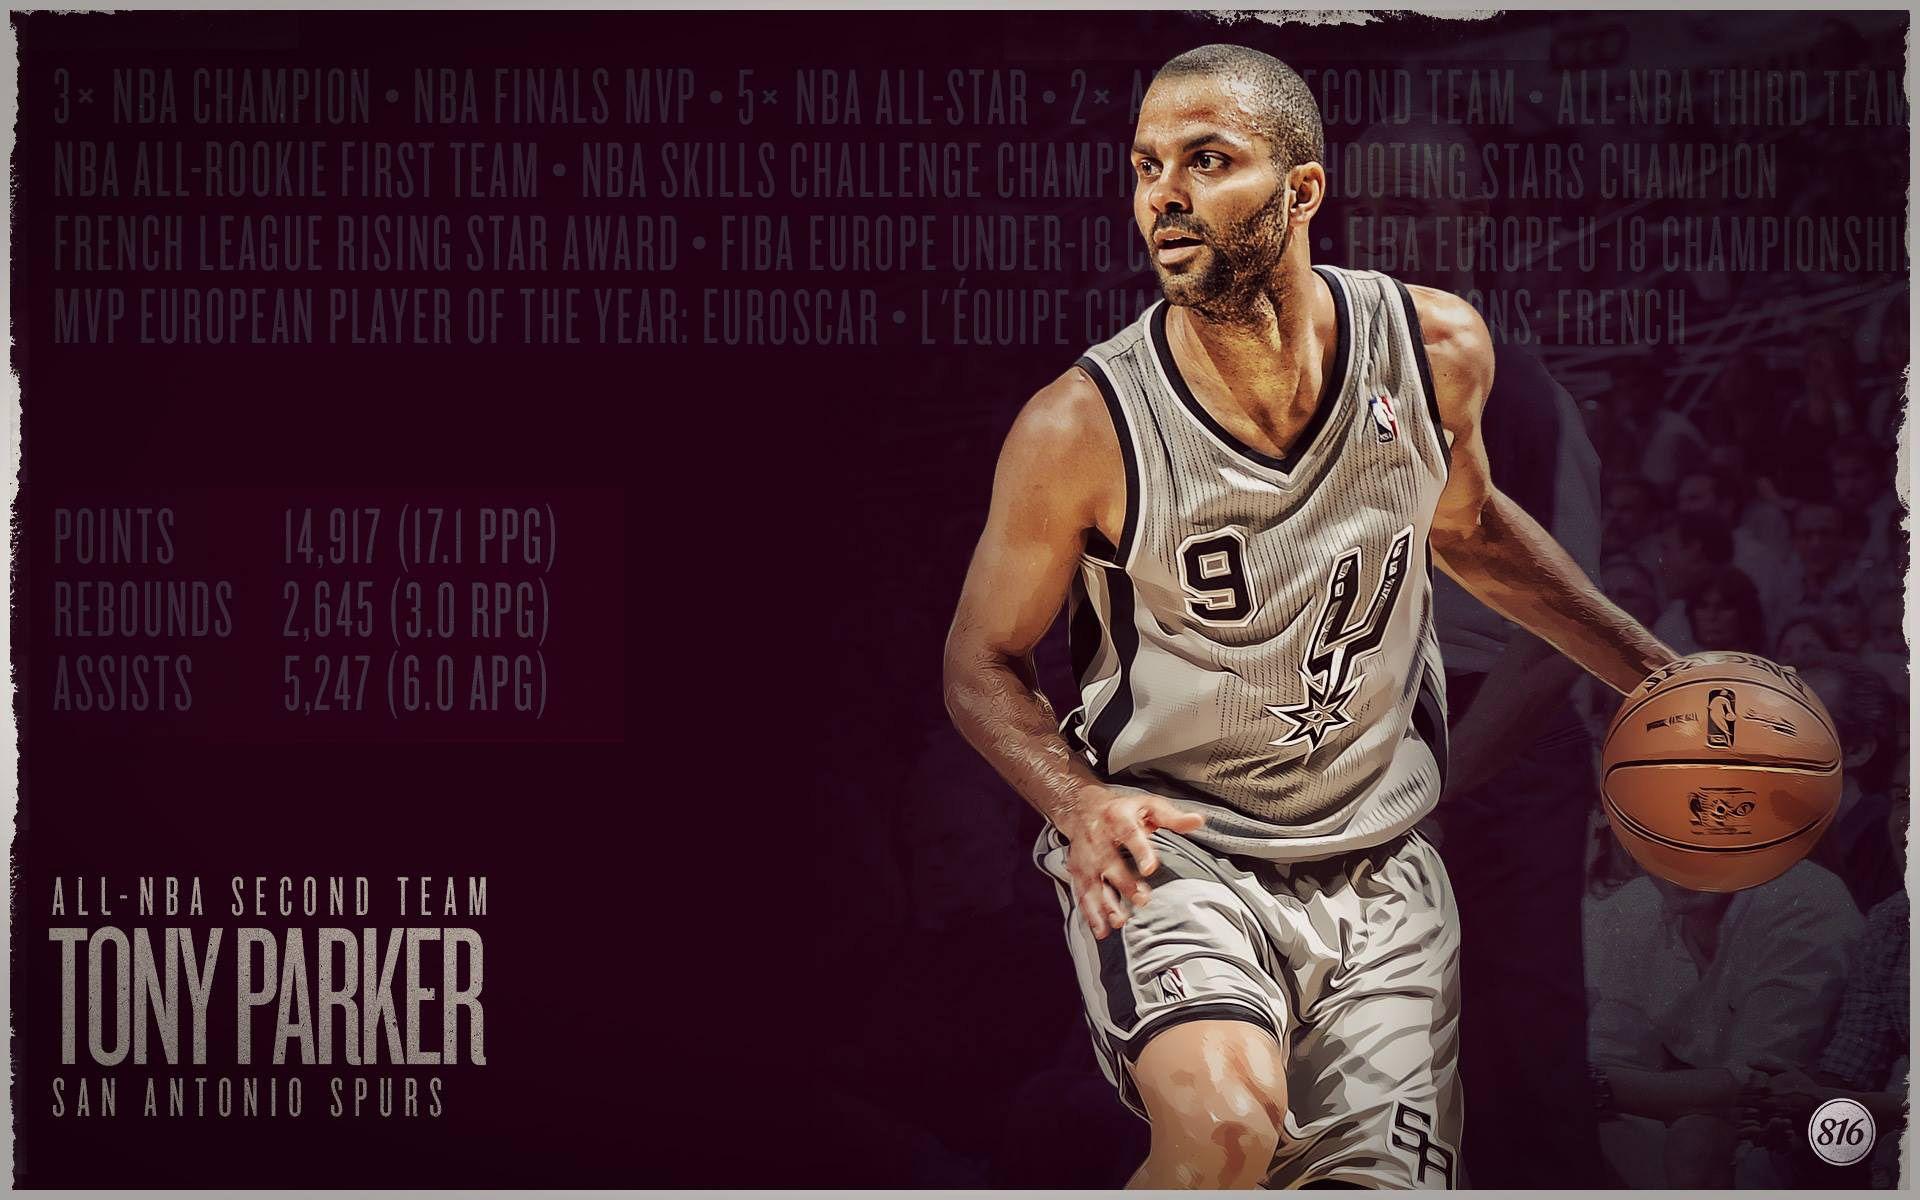 a7c3eb1b7 Tony Parker Desktop Wallpaper - San Antonio Spurs